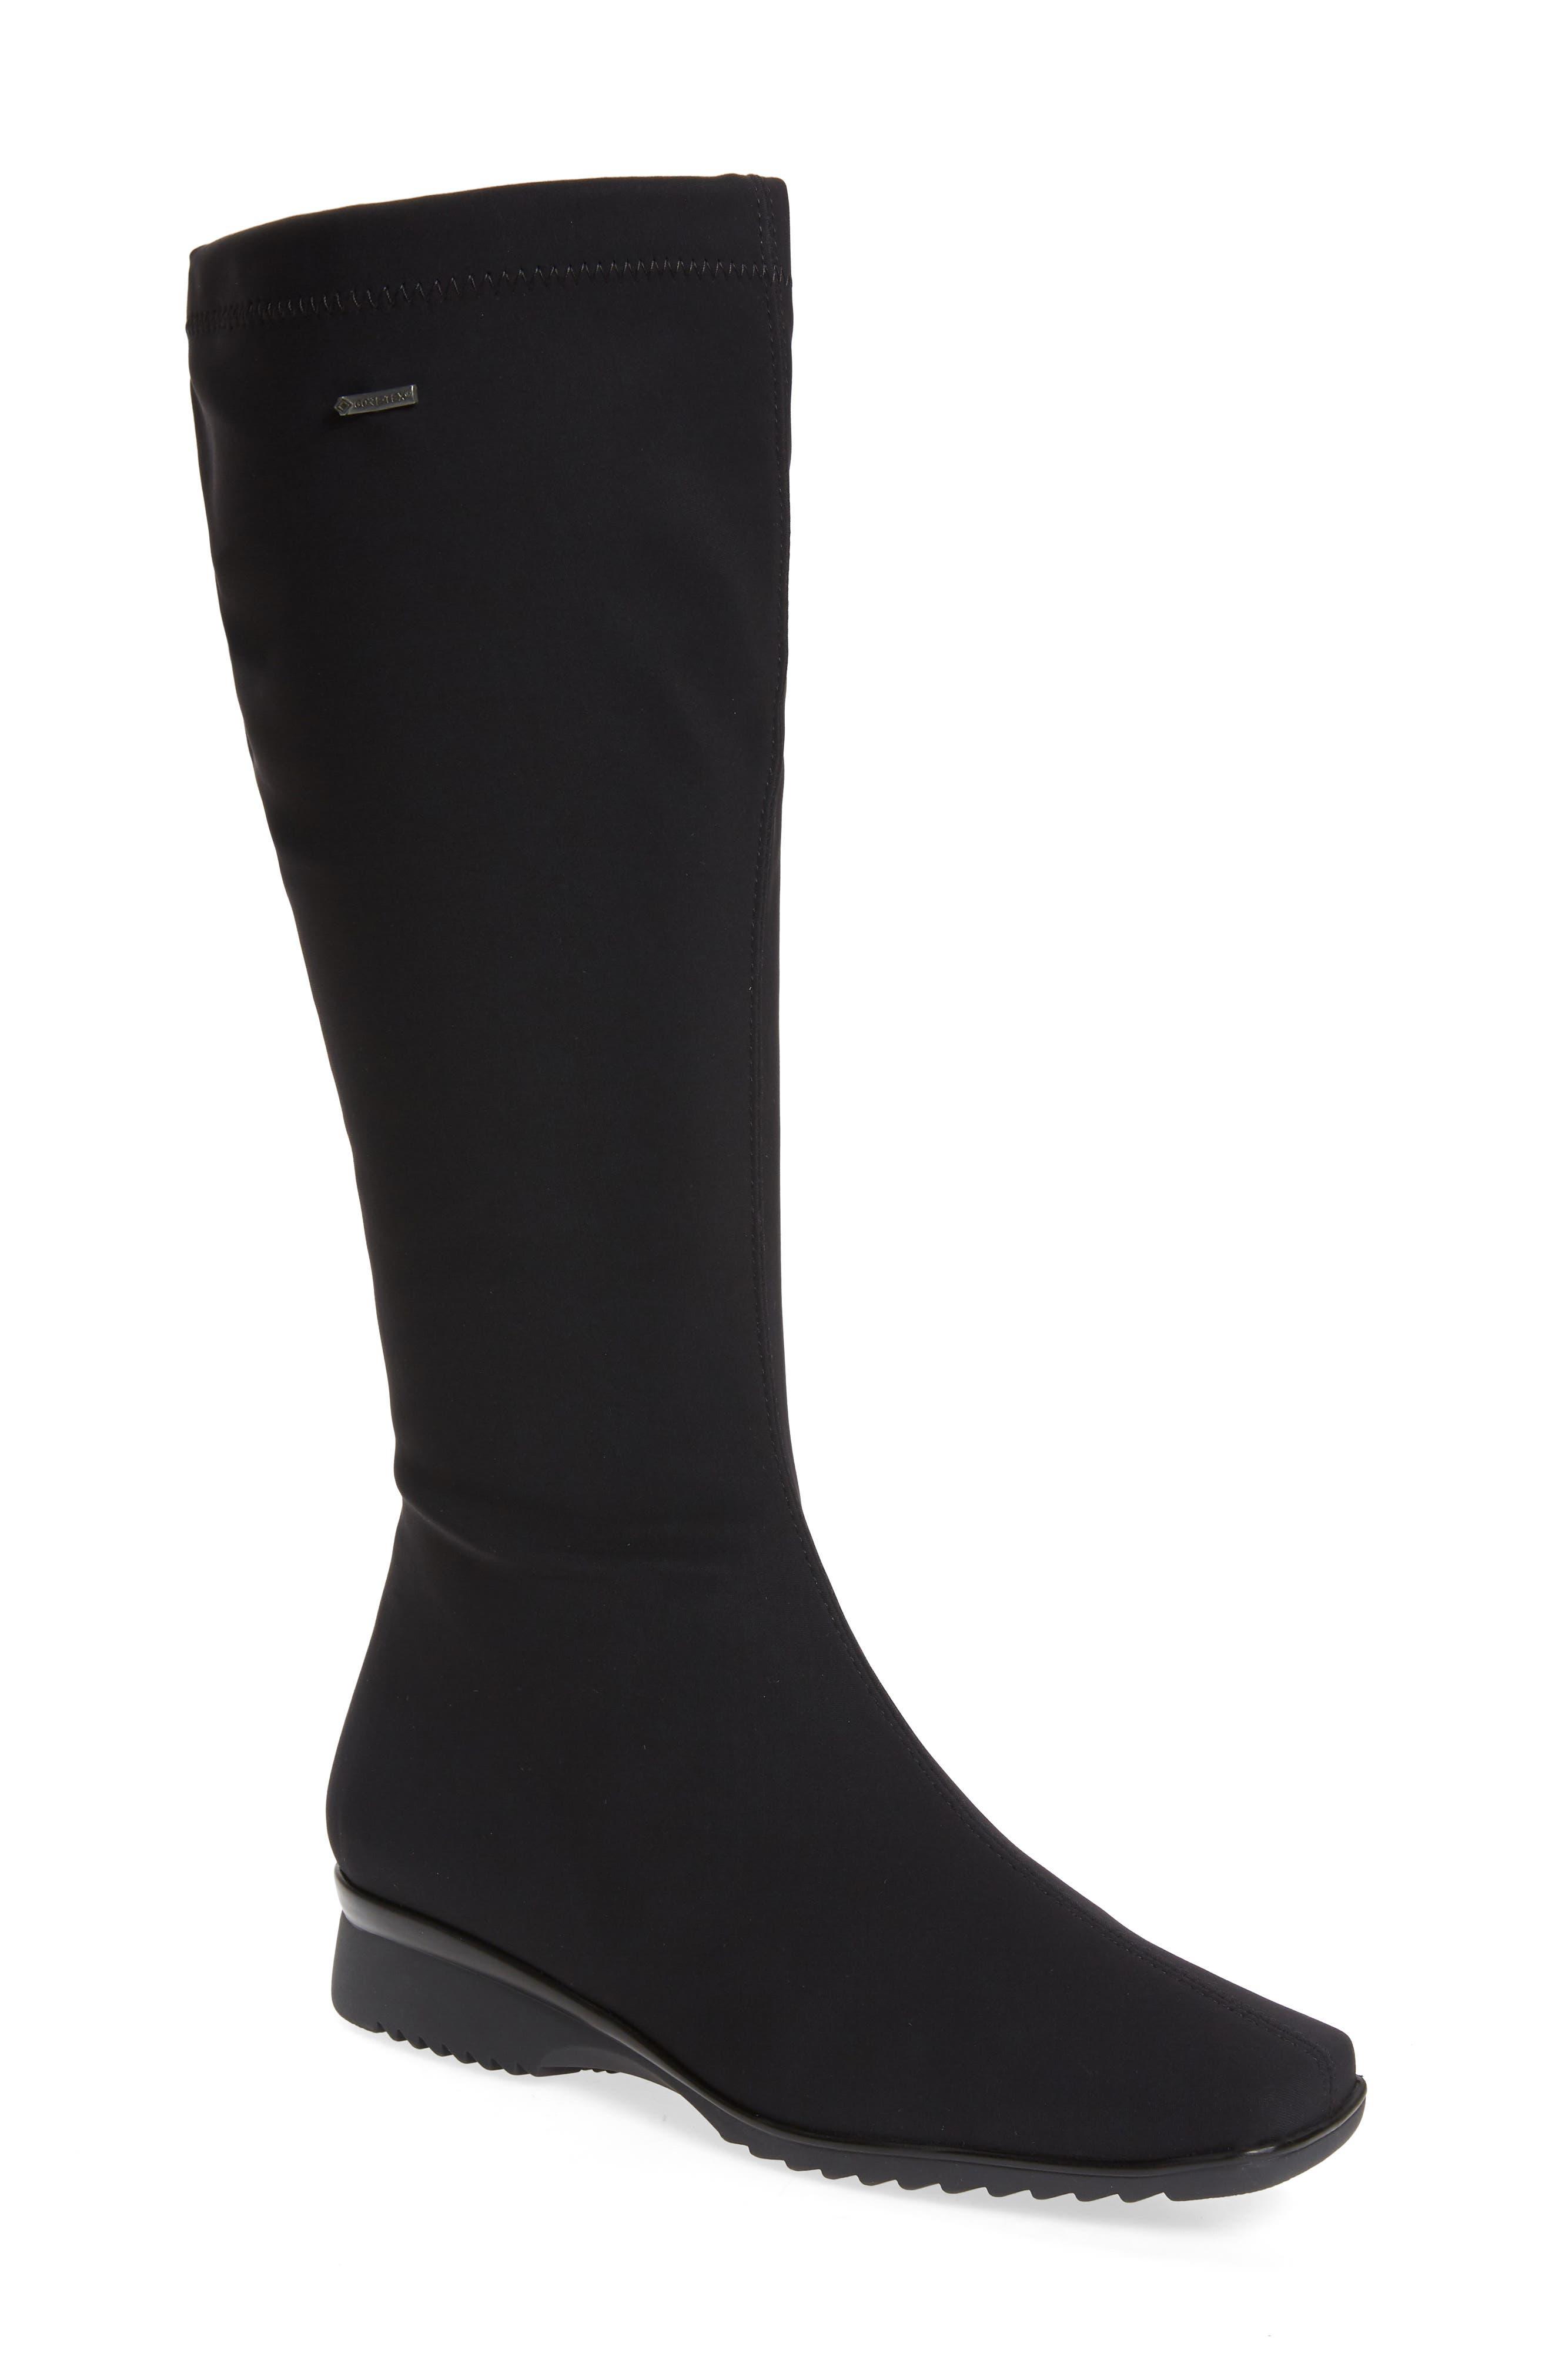 'Paula' Weatherproof Gore-Tex Boot